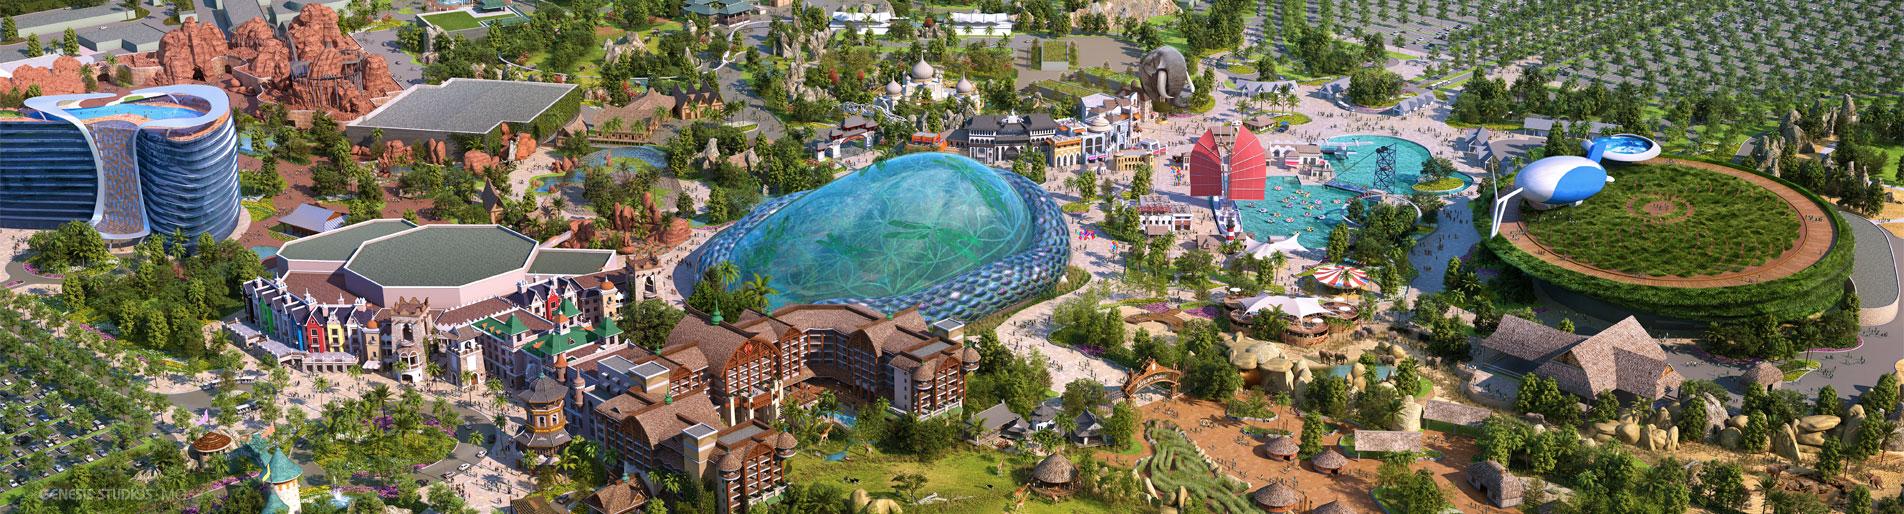 Digital 3D Architectural Renderings of Zhengzhou Zoo